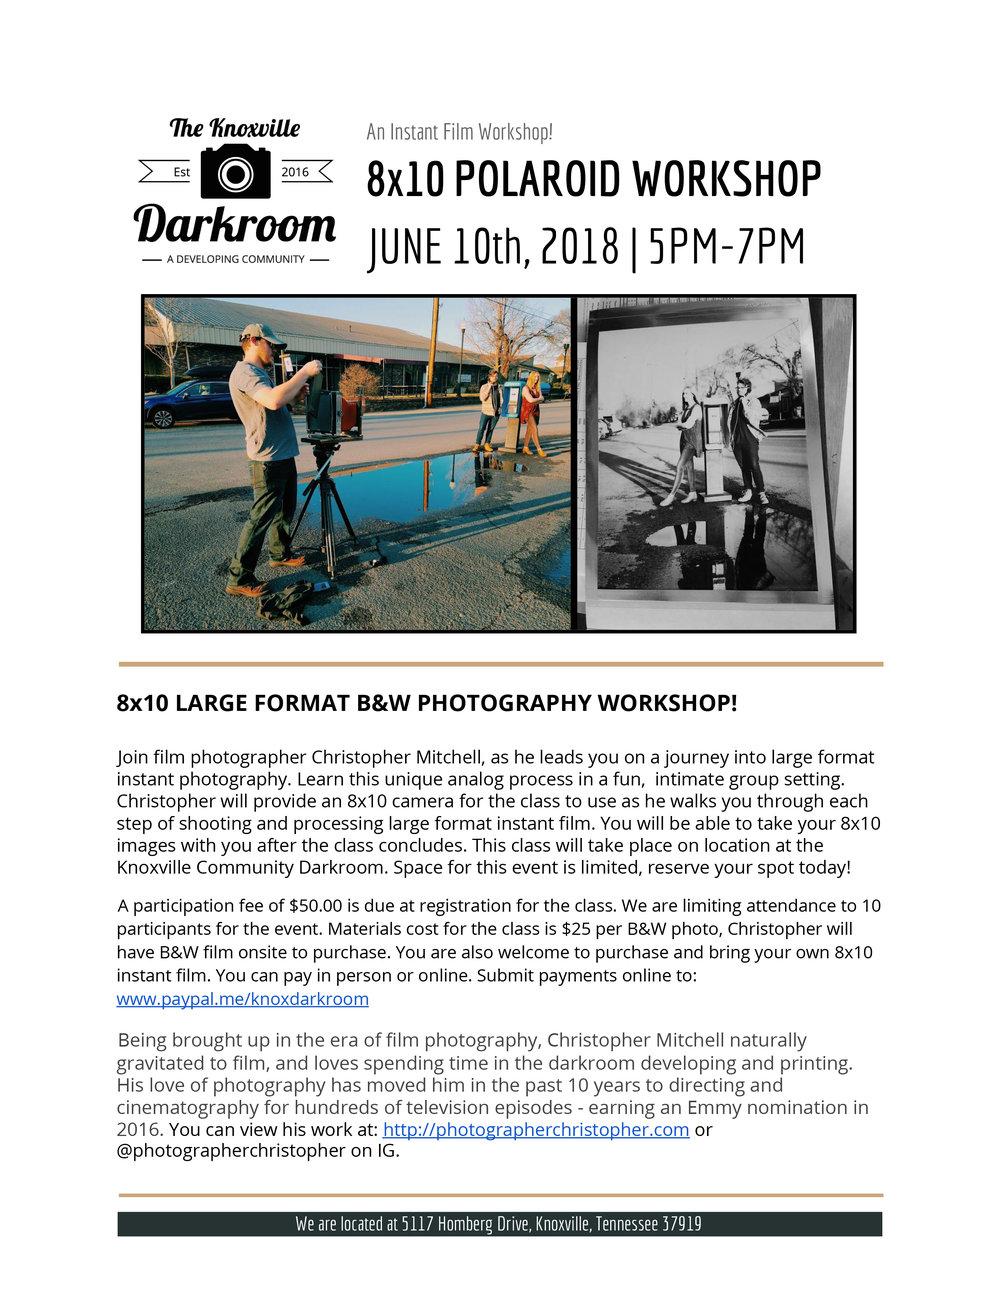 KCD Flyer - 8x10 Polaroid Workshop (1).jpg